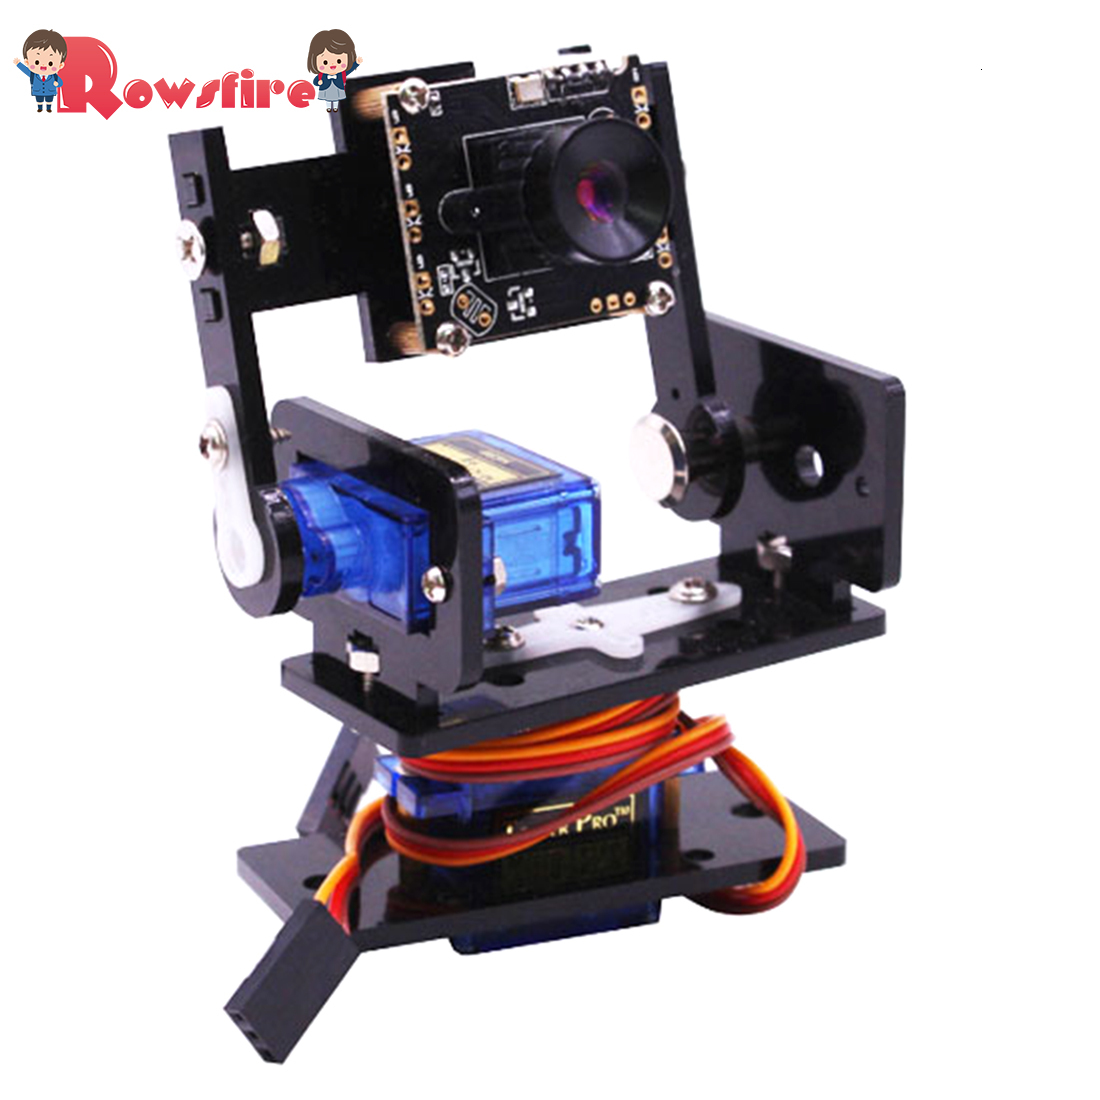 Camera Module Smart Vision Sensor Pan-Tilt Kit With 2 Pcs Micro Servos Smart Robot HD Camera For Raspberry Pi-Camera/Single PTZ